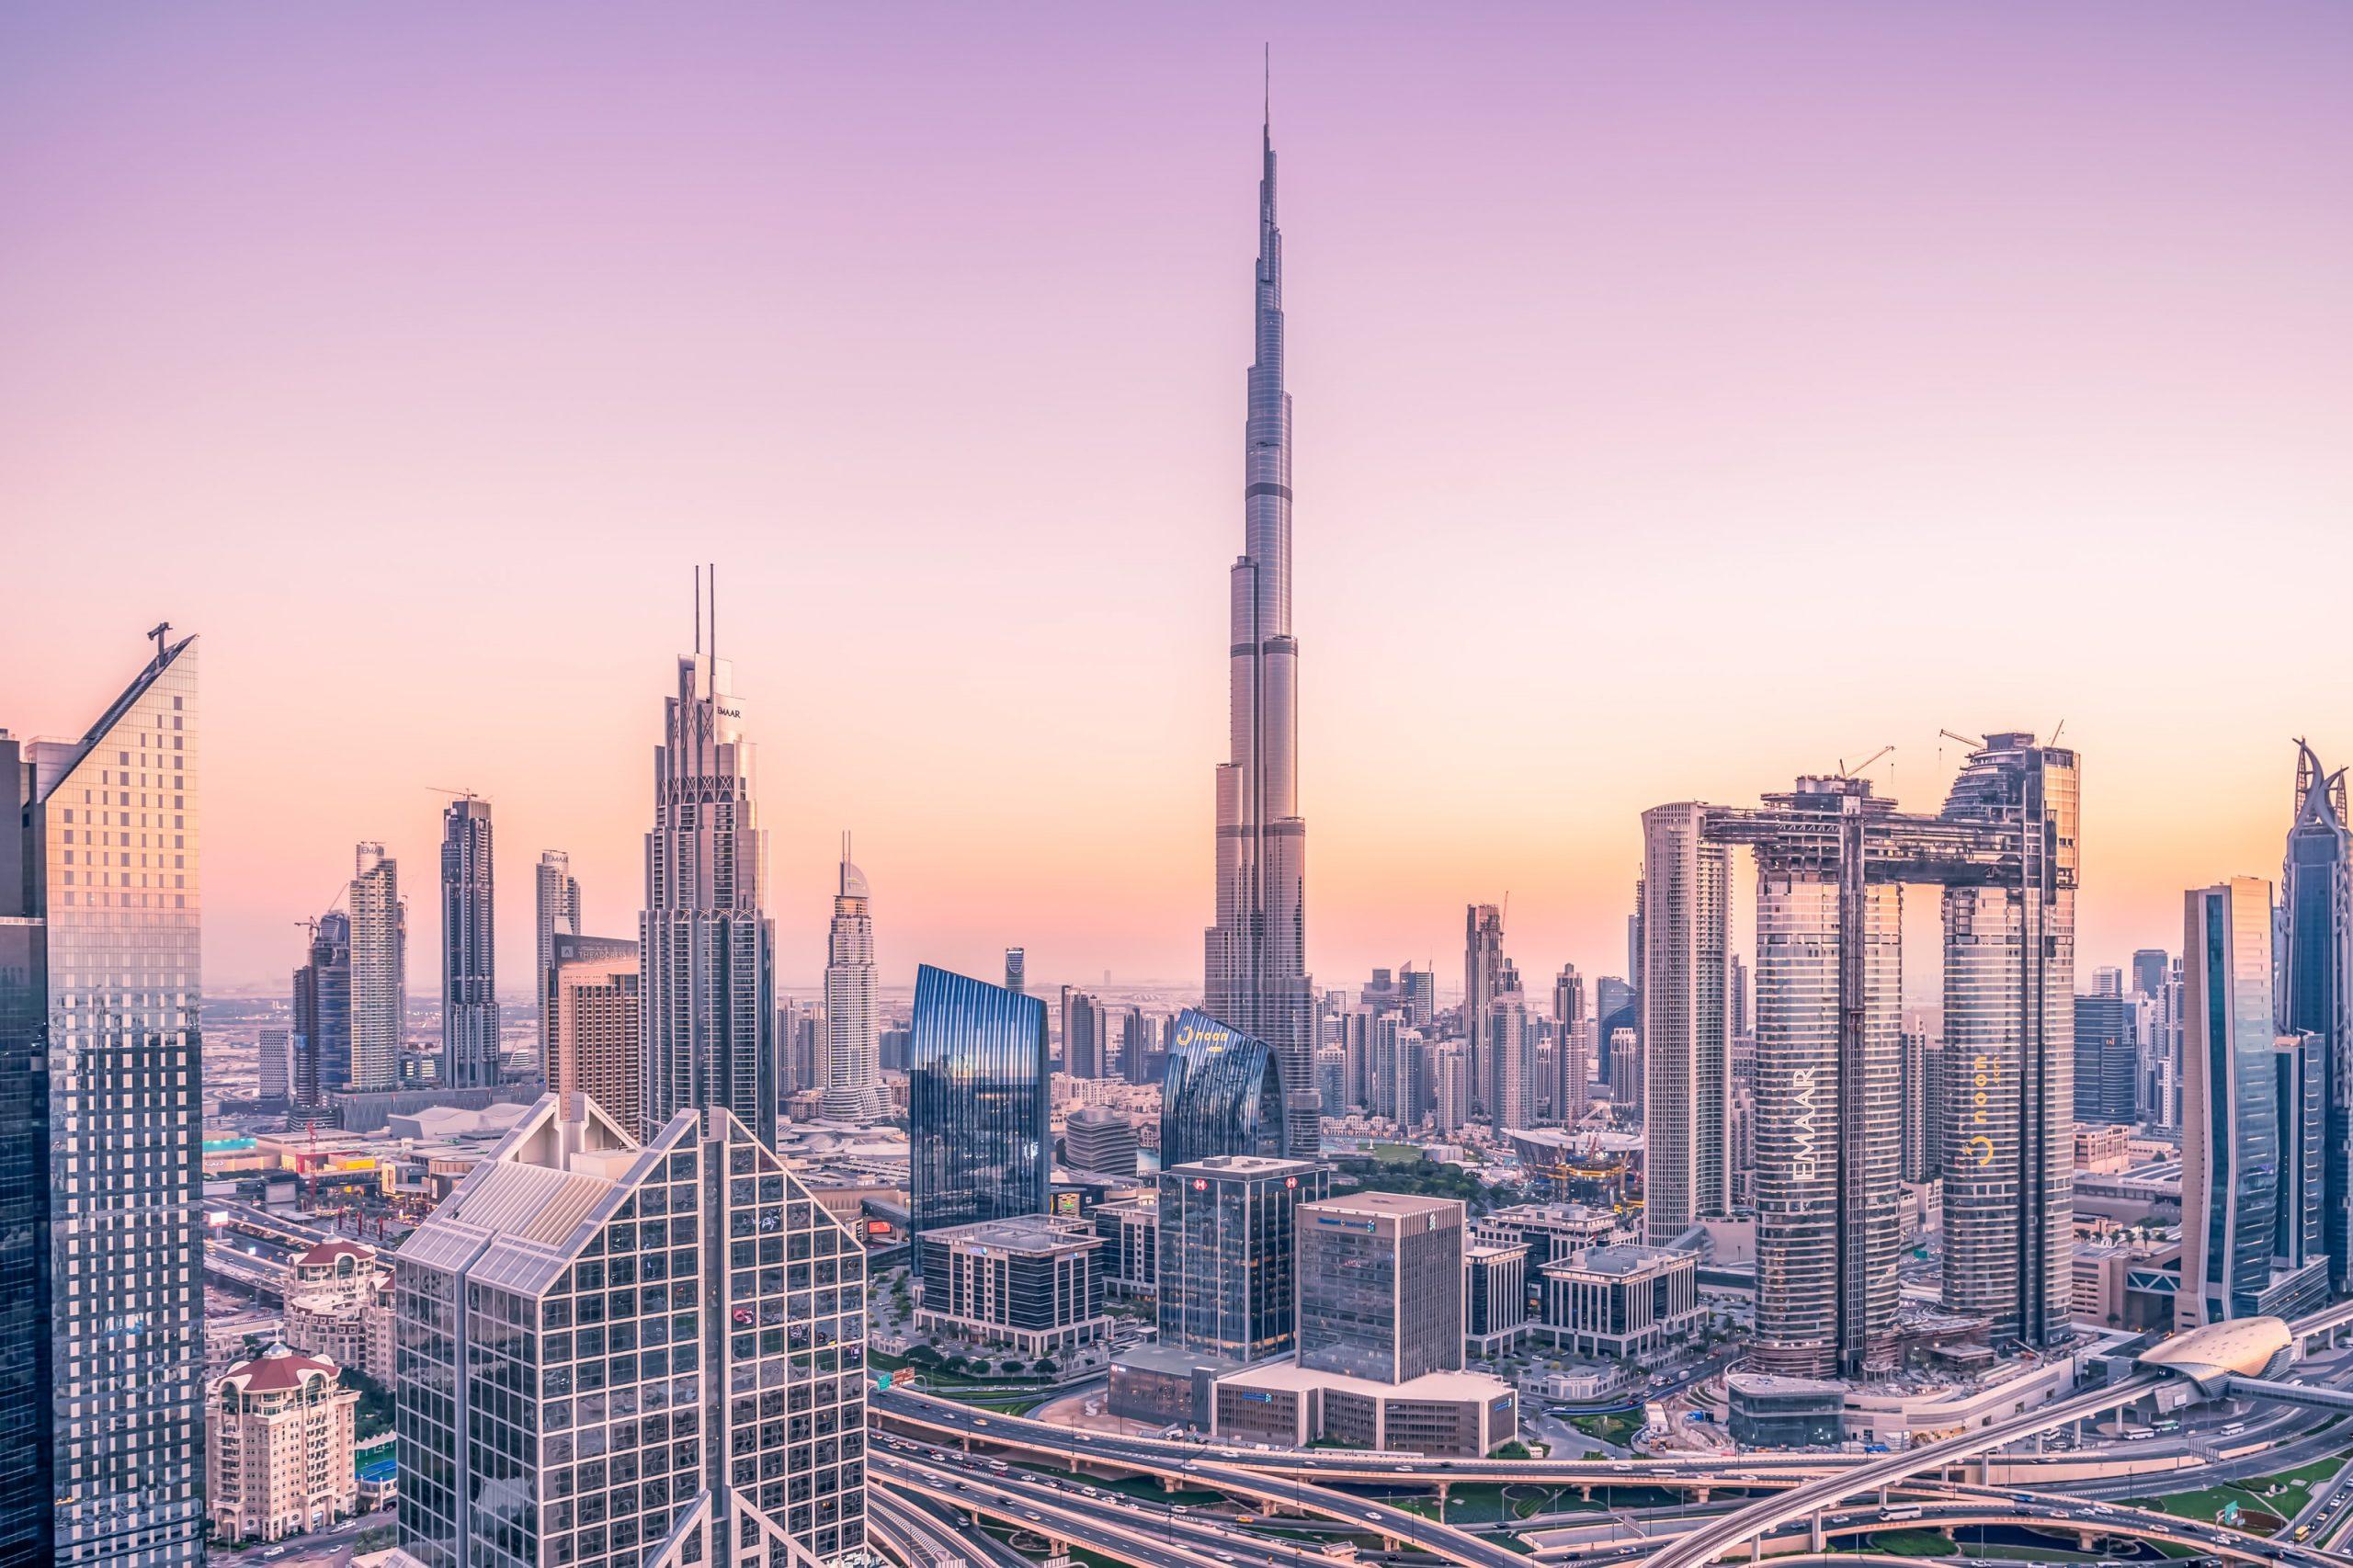 10 Dubai Hotels With Amazing Burj Khalifa Views